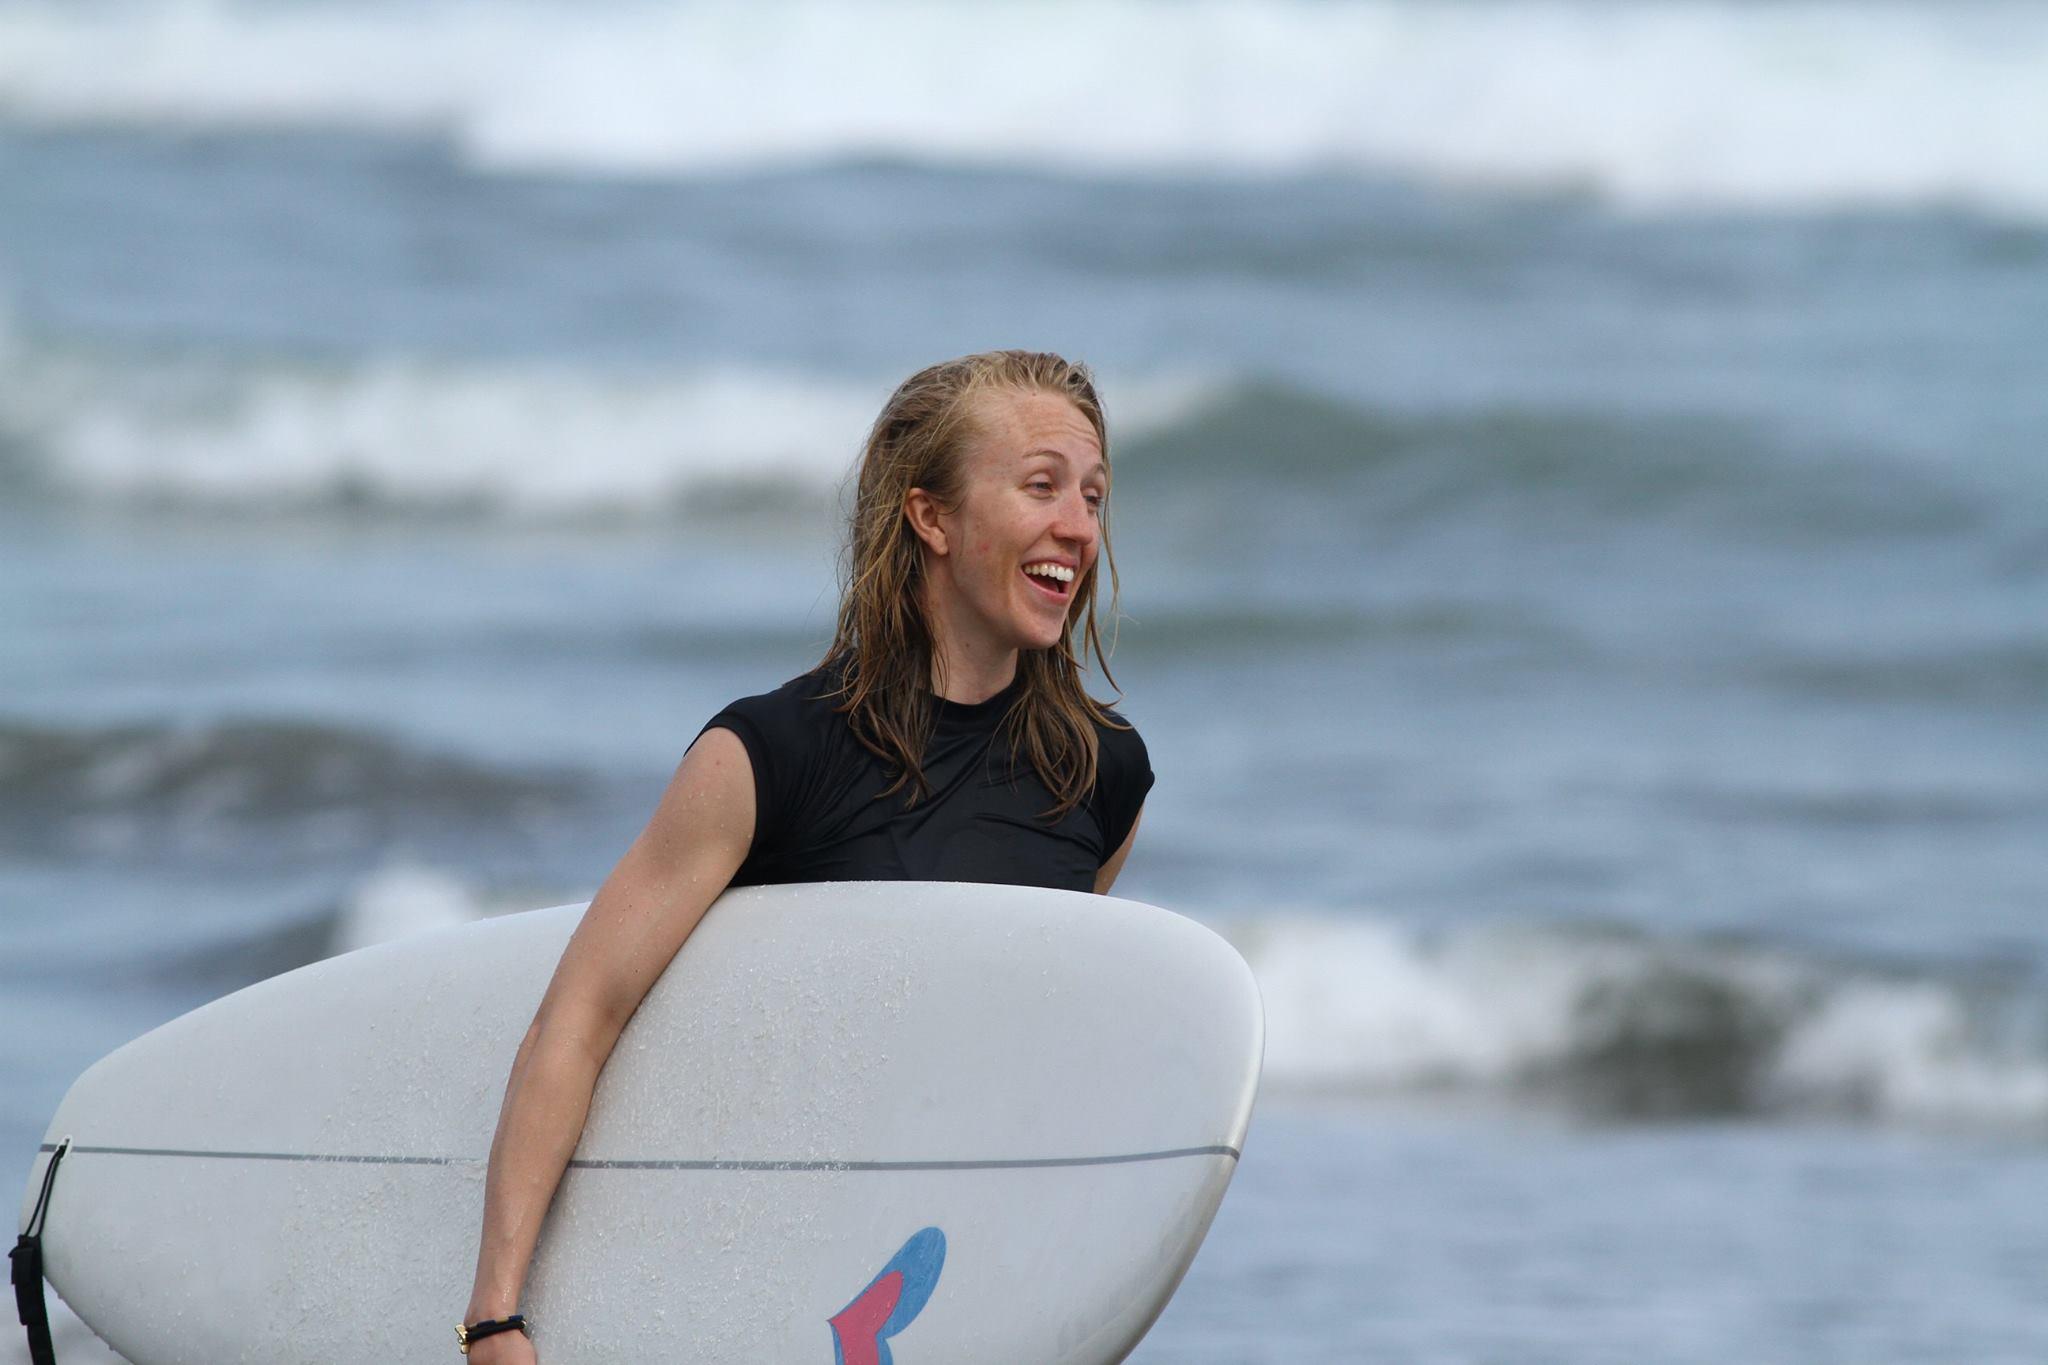 Surf, Retreat, Bali, Salti Hearts, surfer Girl